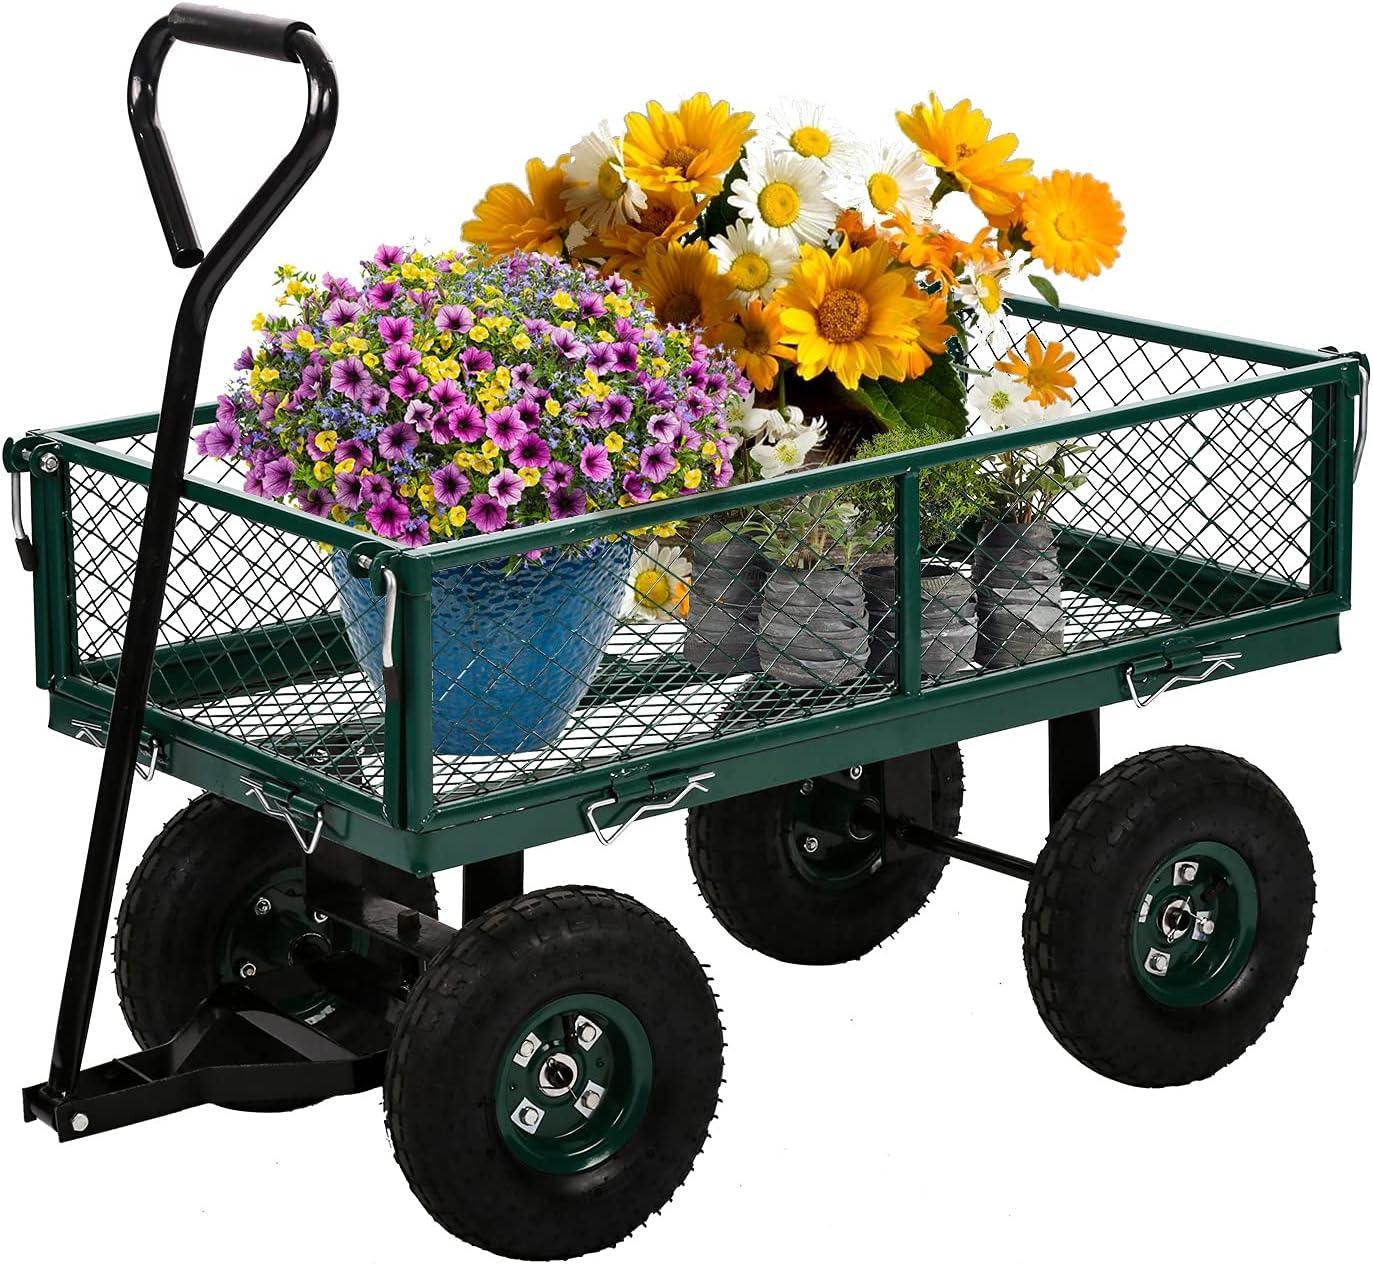 HCY Wagons Cart Ranking Super popular specialty store TOP14 Heavy Duty Mesh Lawn Ut Steel Garden 400Lbs